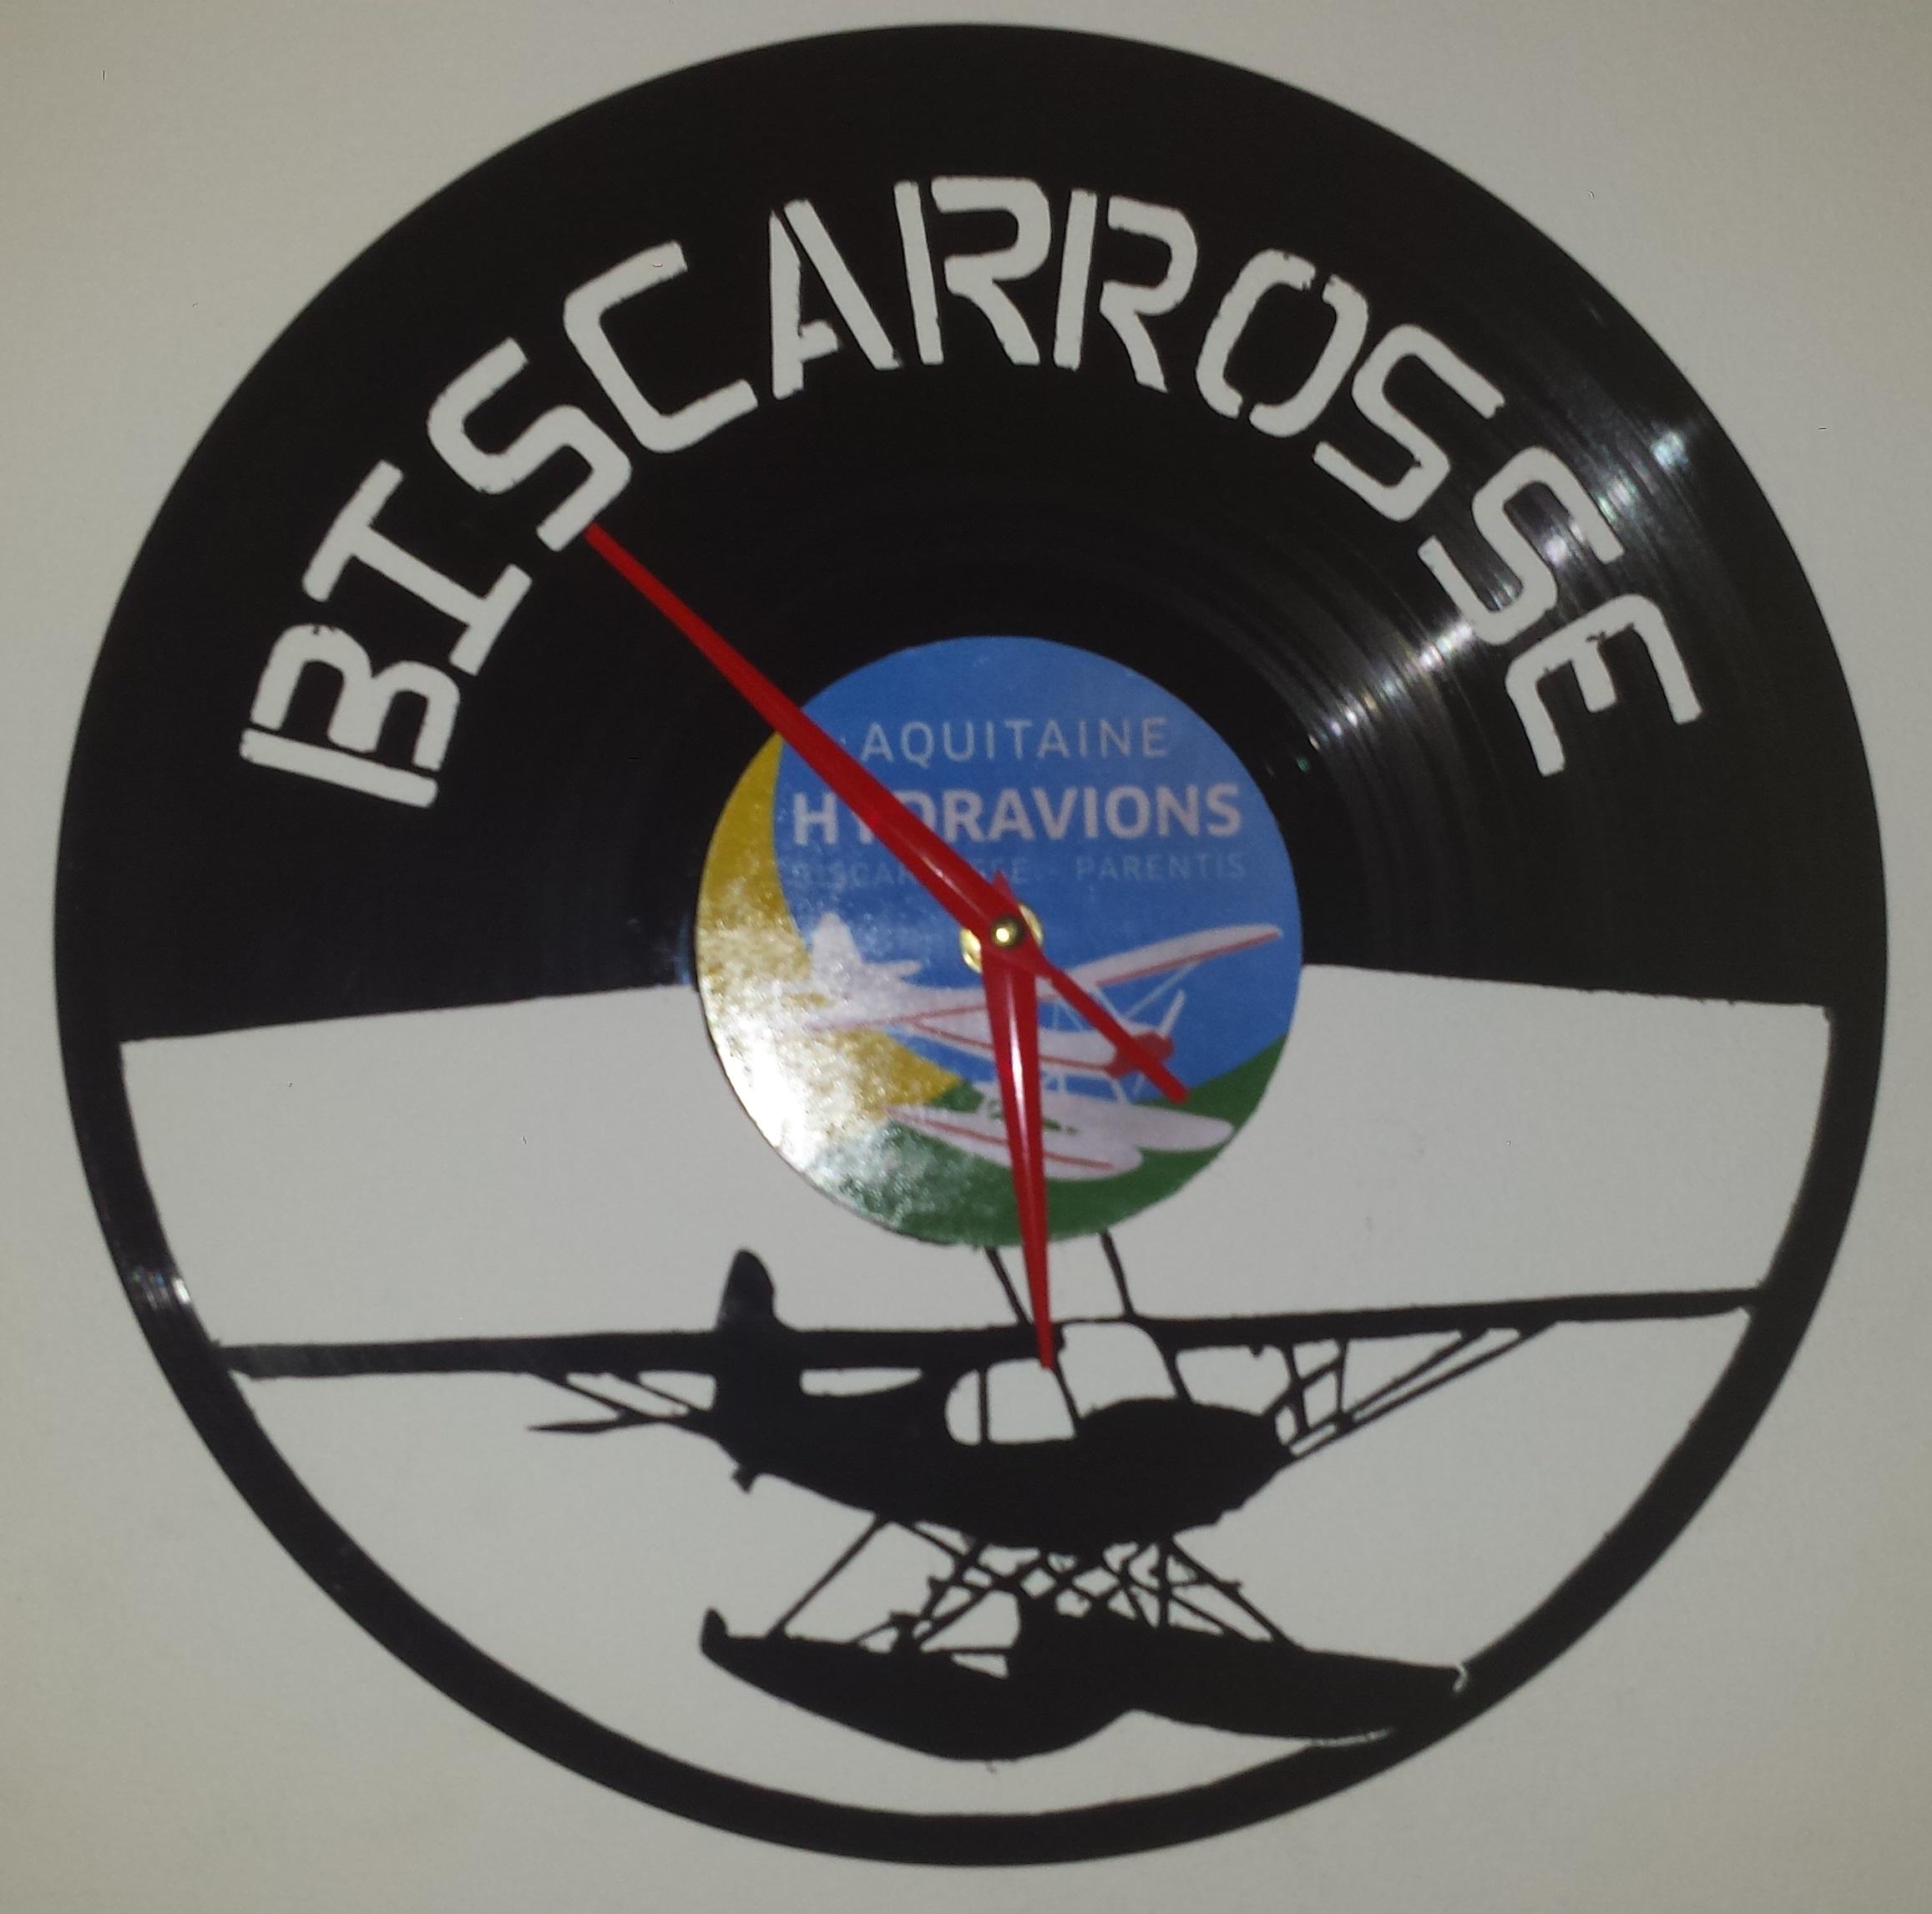 biscarrosse hydravion